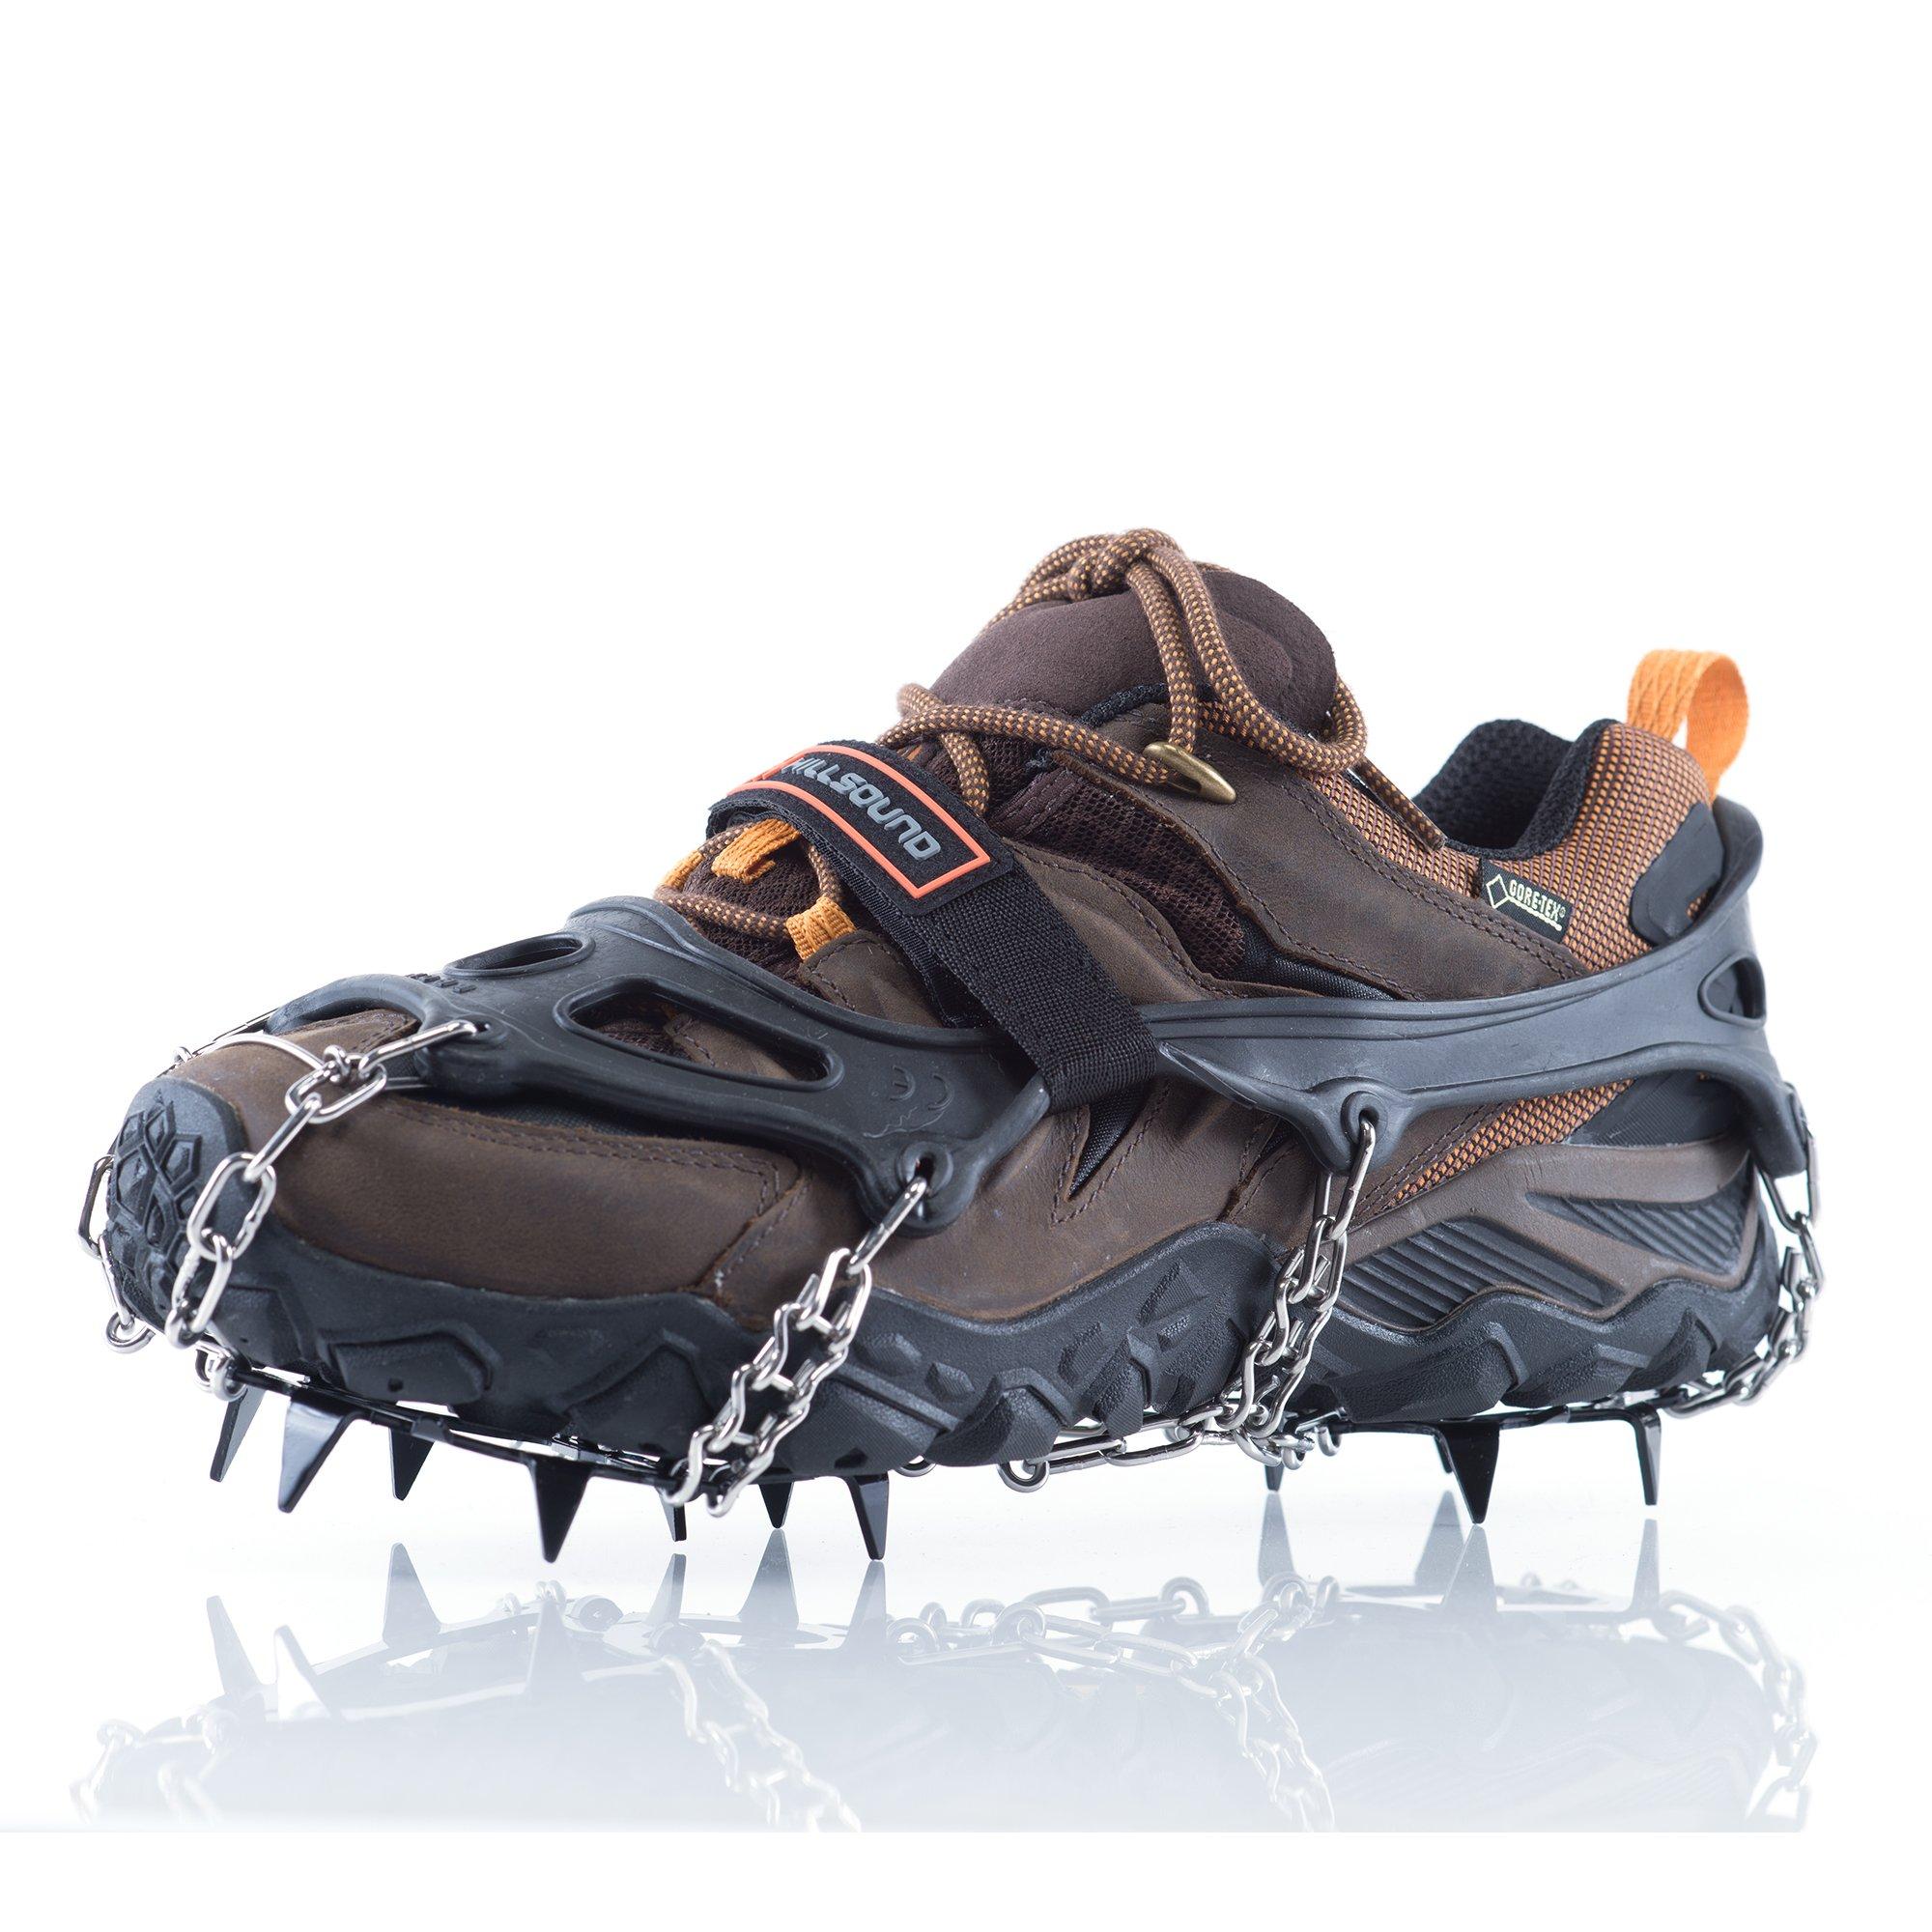 Hillsound Trail Crampon Traction Device, Black, Medium